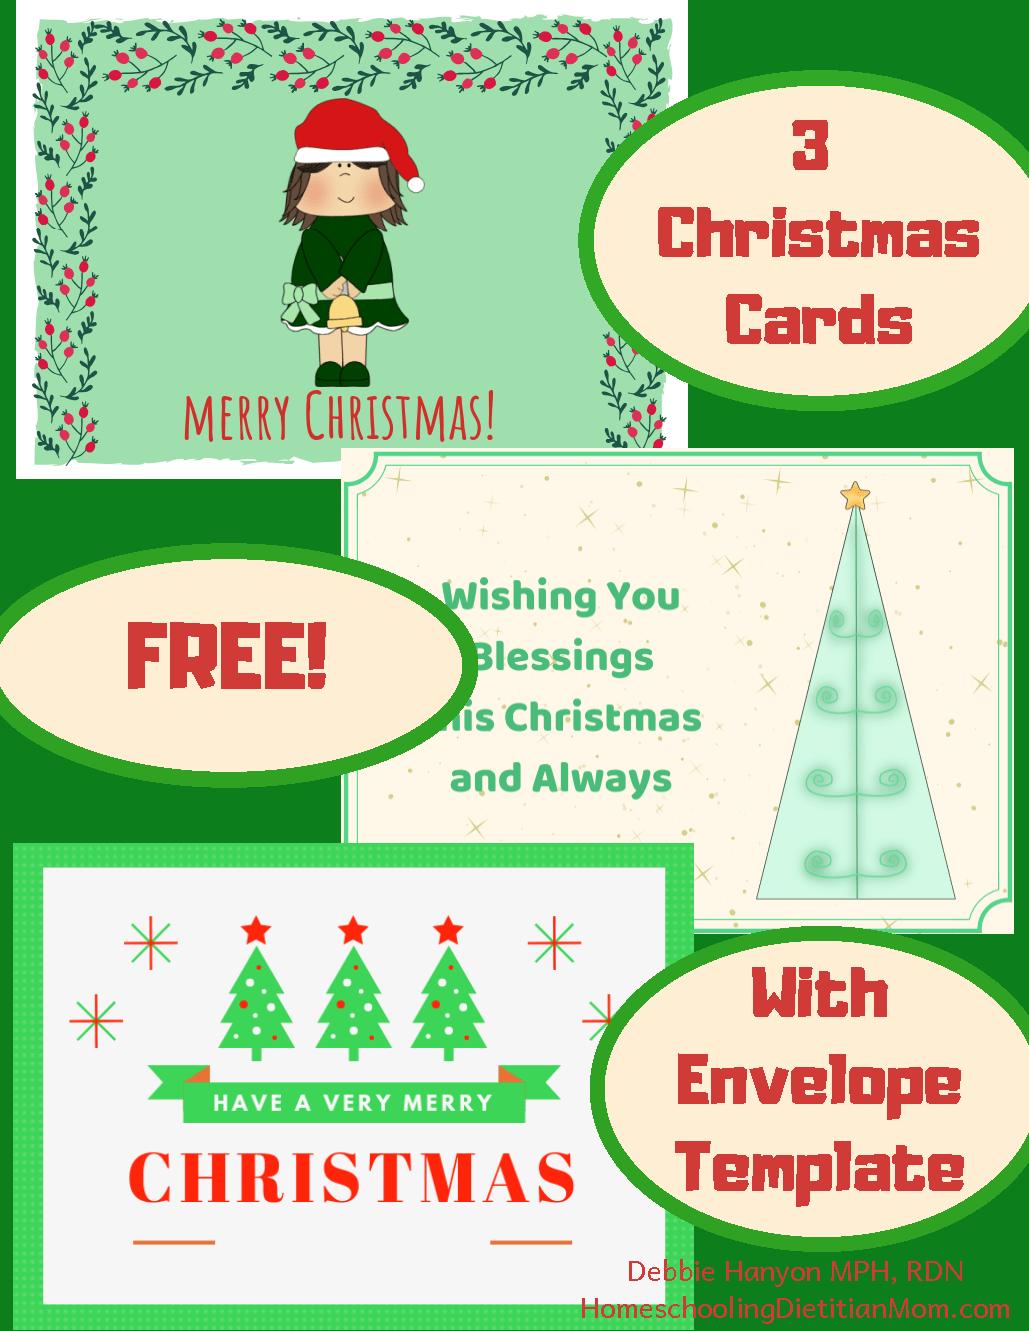 13 Online Christmas Card Envelopes Templates Download with Christmas Card Envelopes Templates